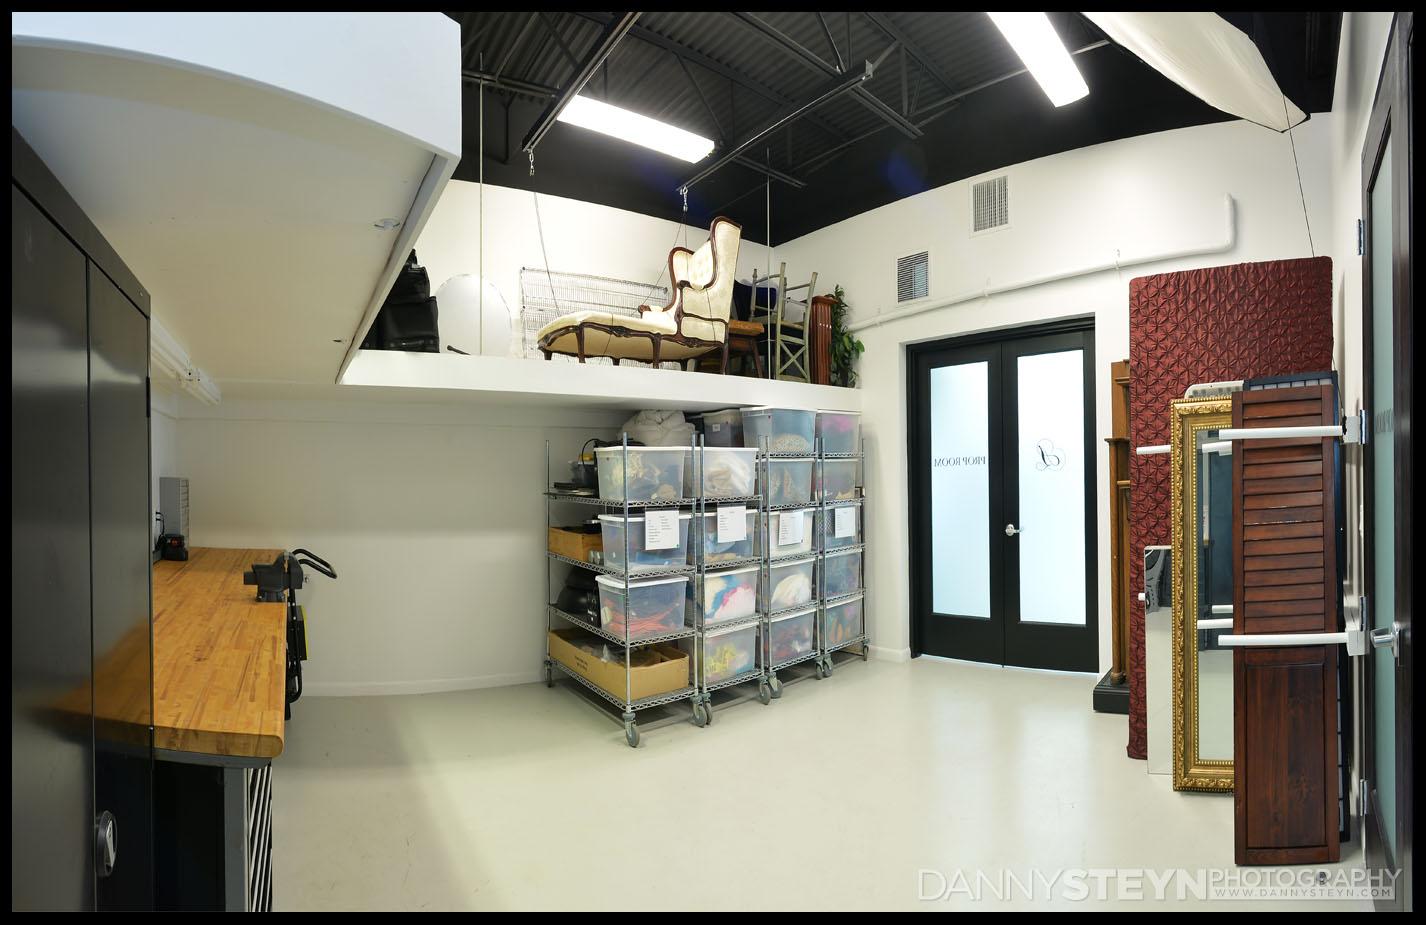 Danny Steyn Photography Studios - Prop Room